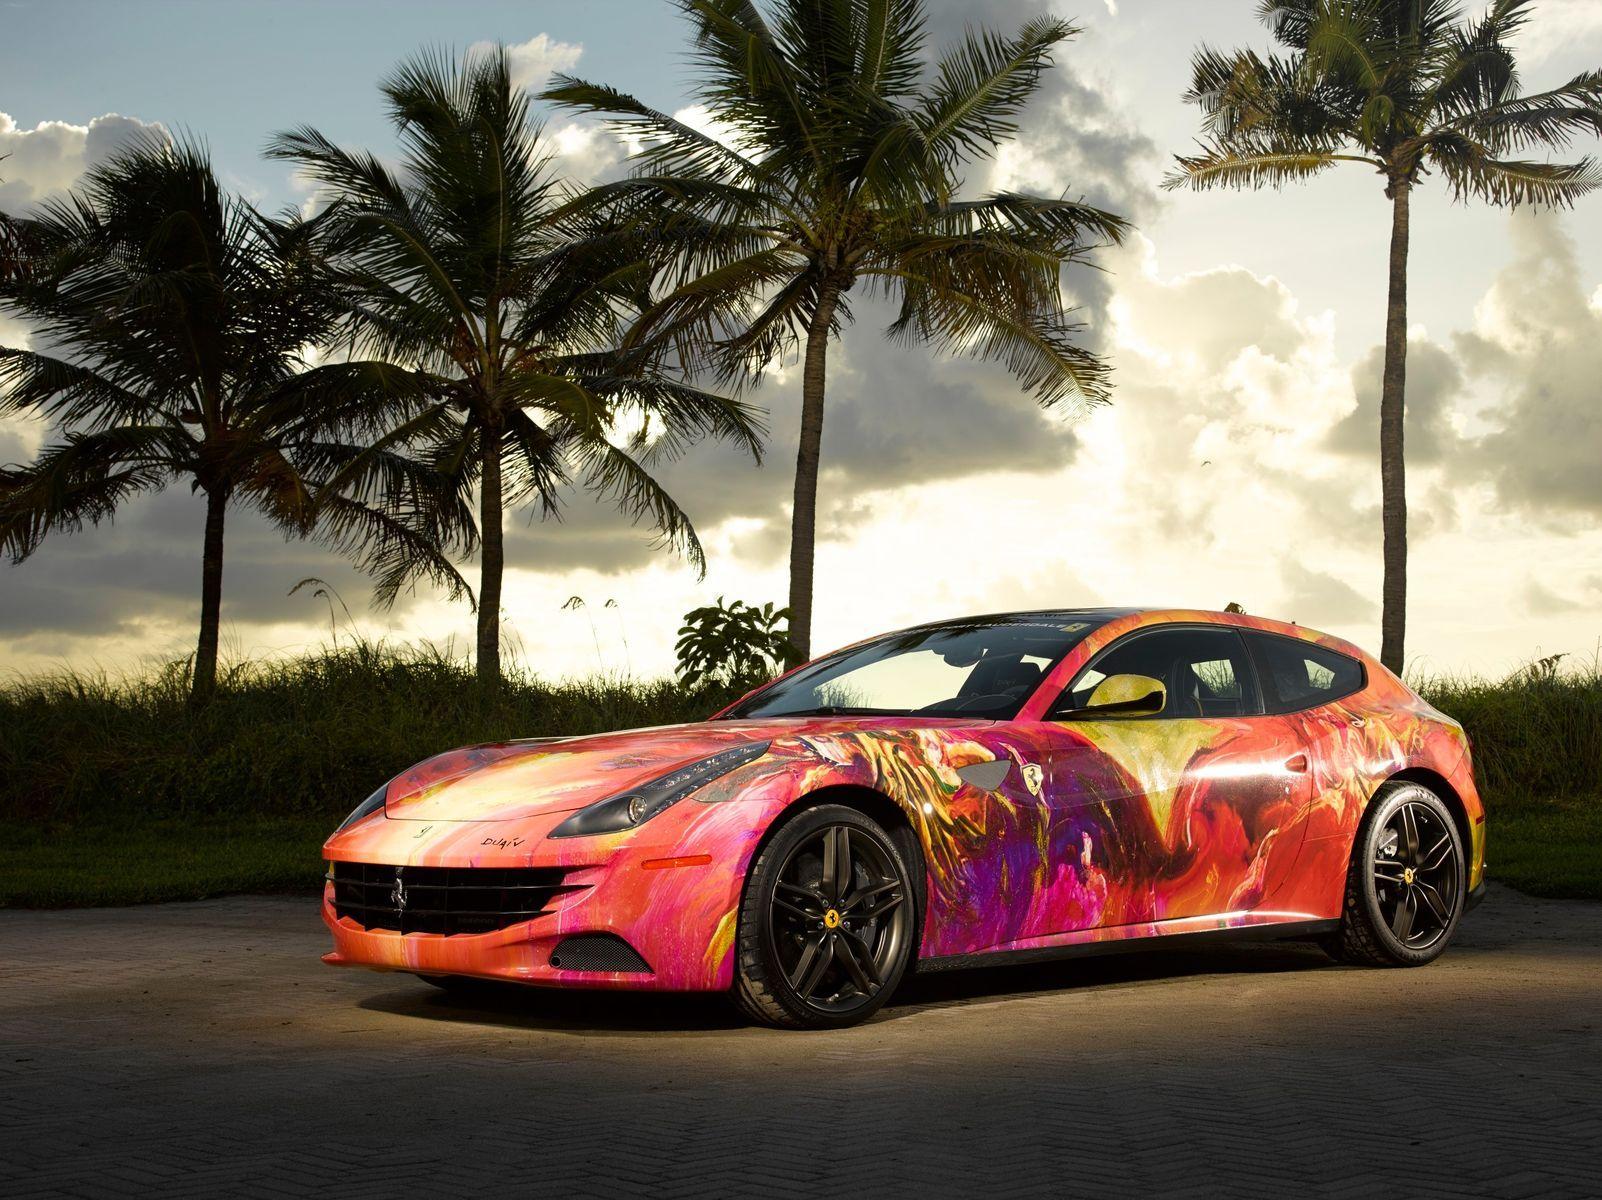 Ferrari FF | Ferrari FF by Duaiv